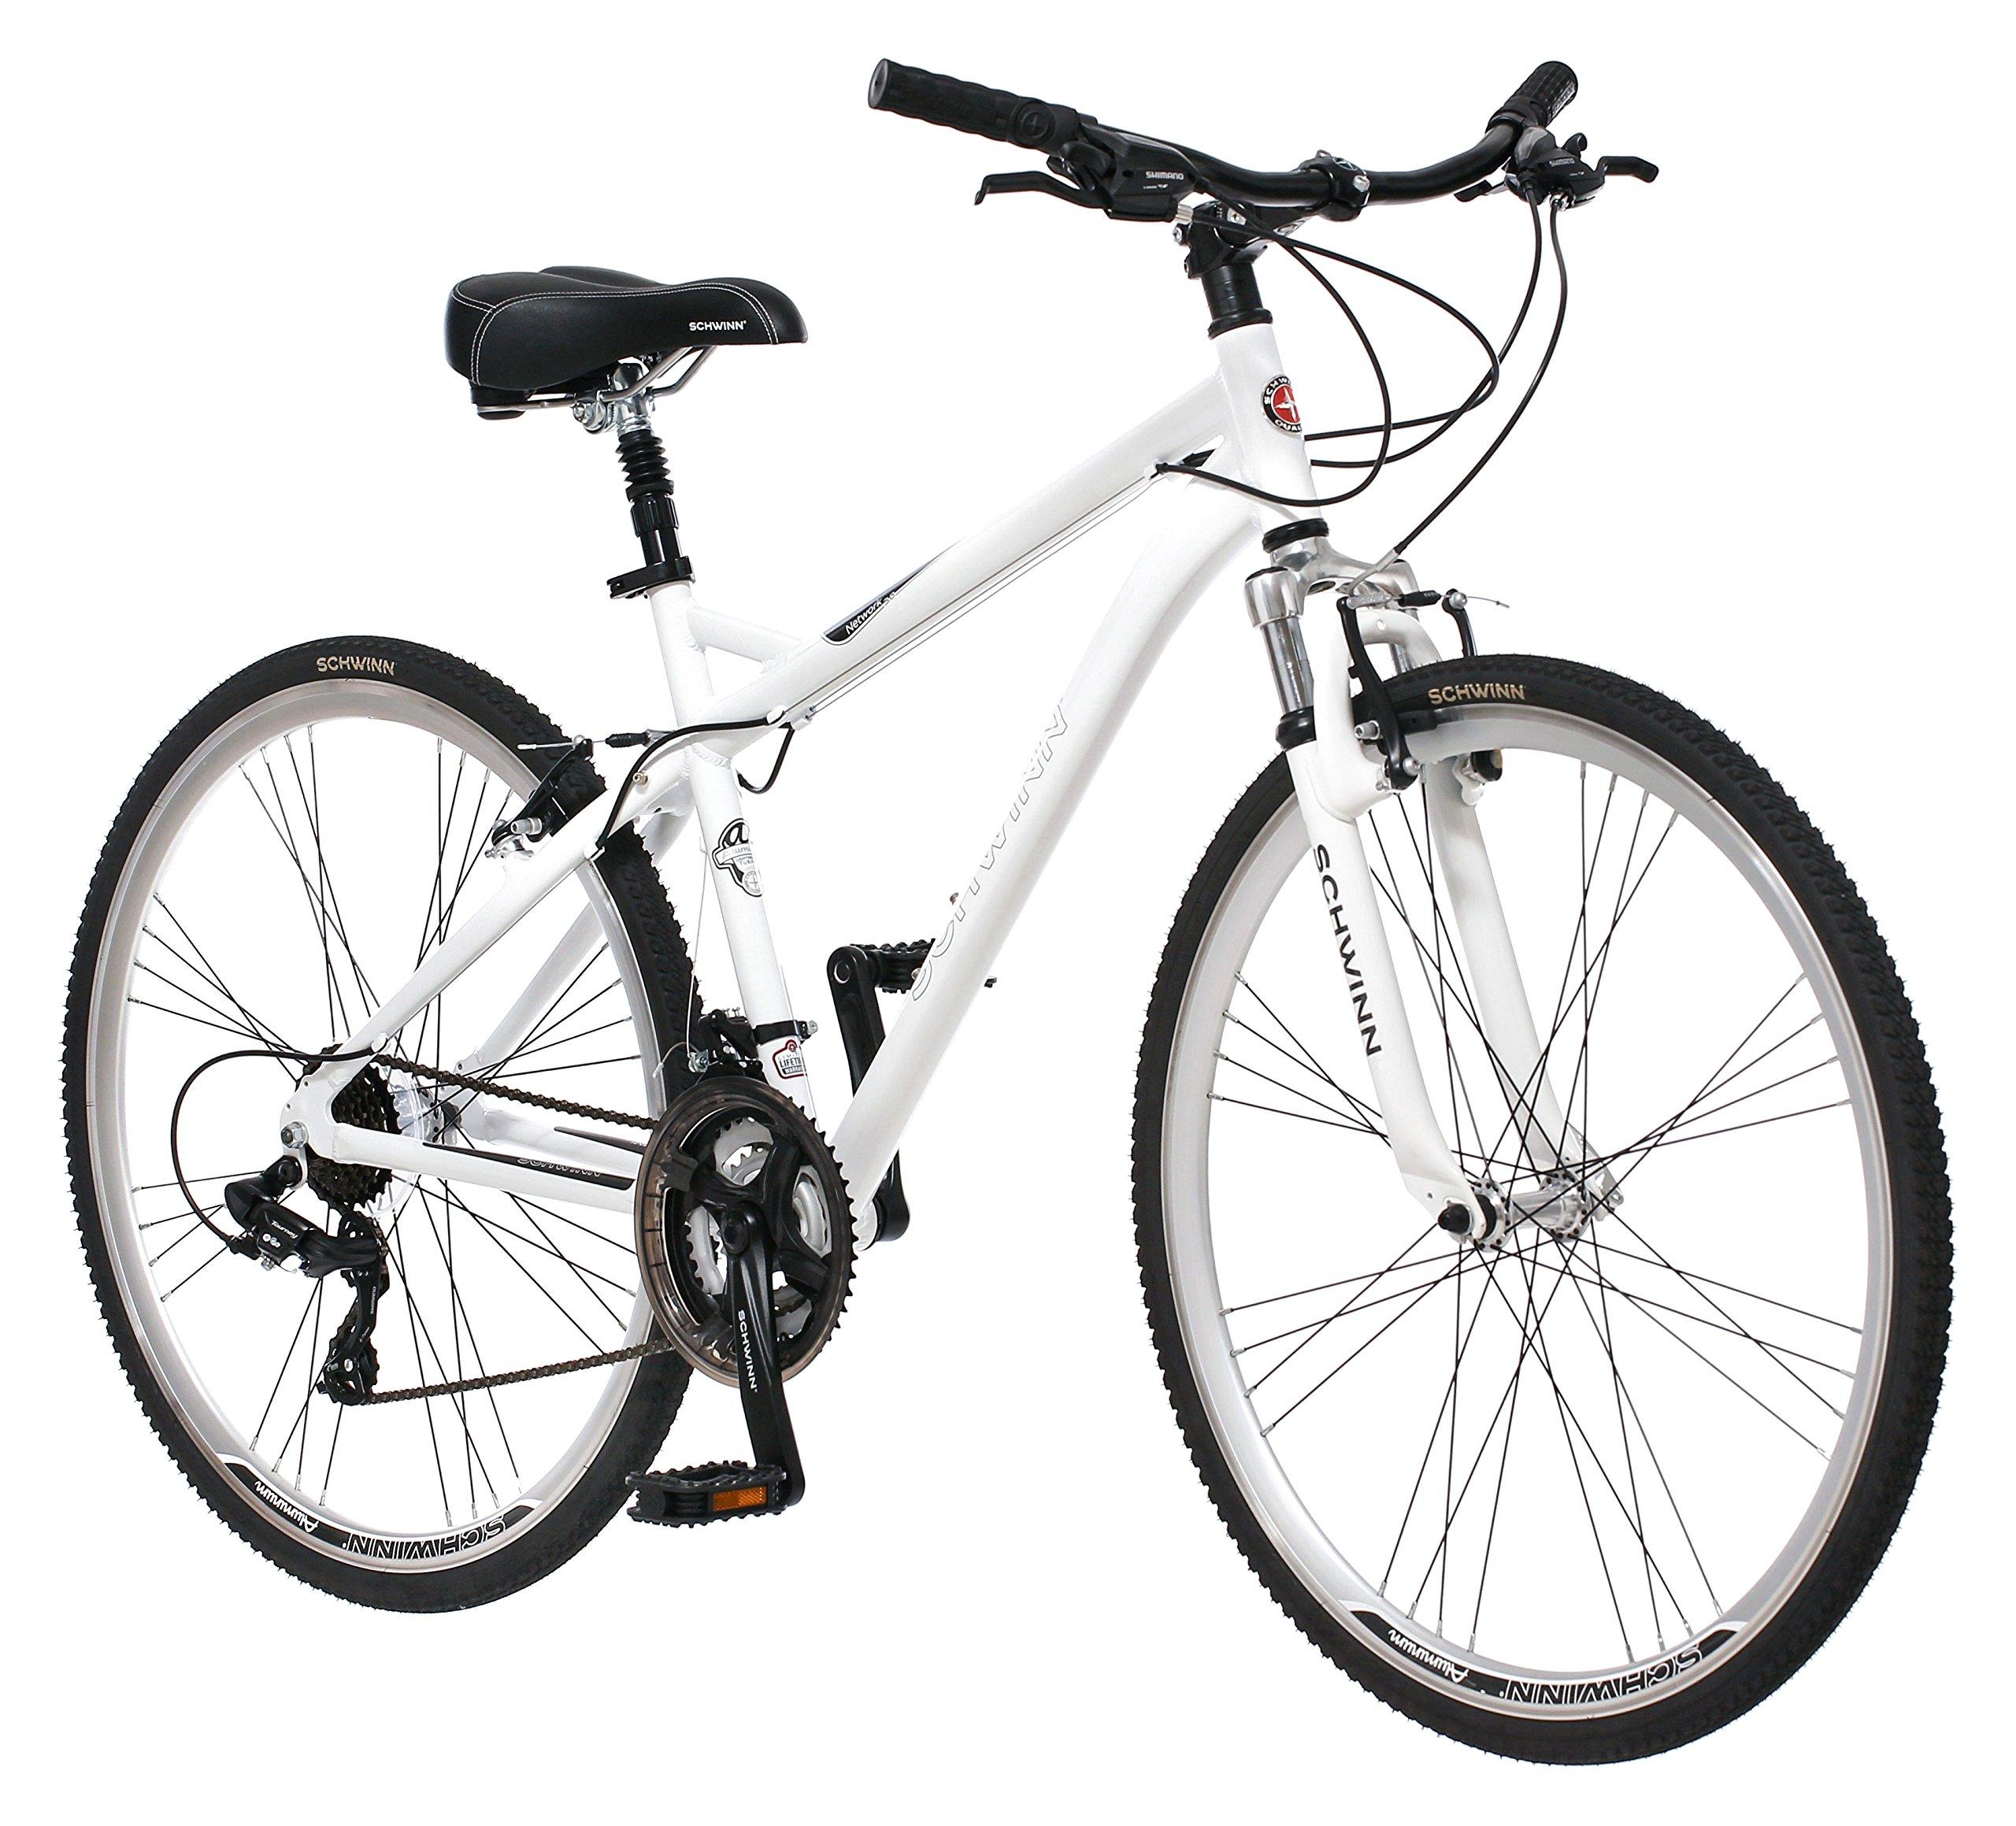 Schwinn Men's Network 3.0 700C Wheel Men's Hybrid Bicycle White, 18' Frame size by Schwinn (Image #1)